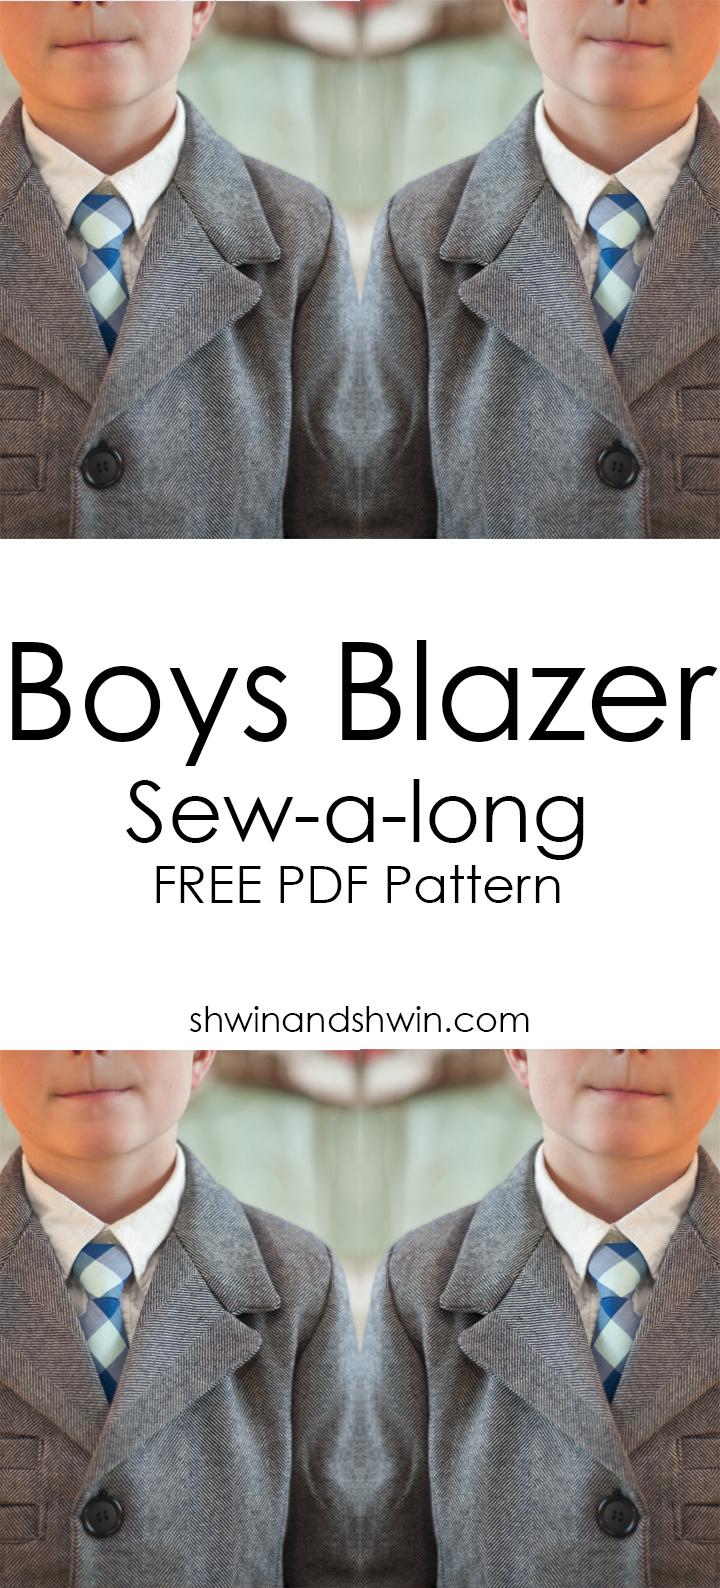 Boys Blazer Pattern Sew-a-long    Shwin&Shwin